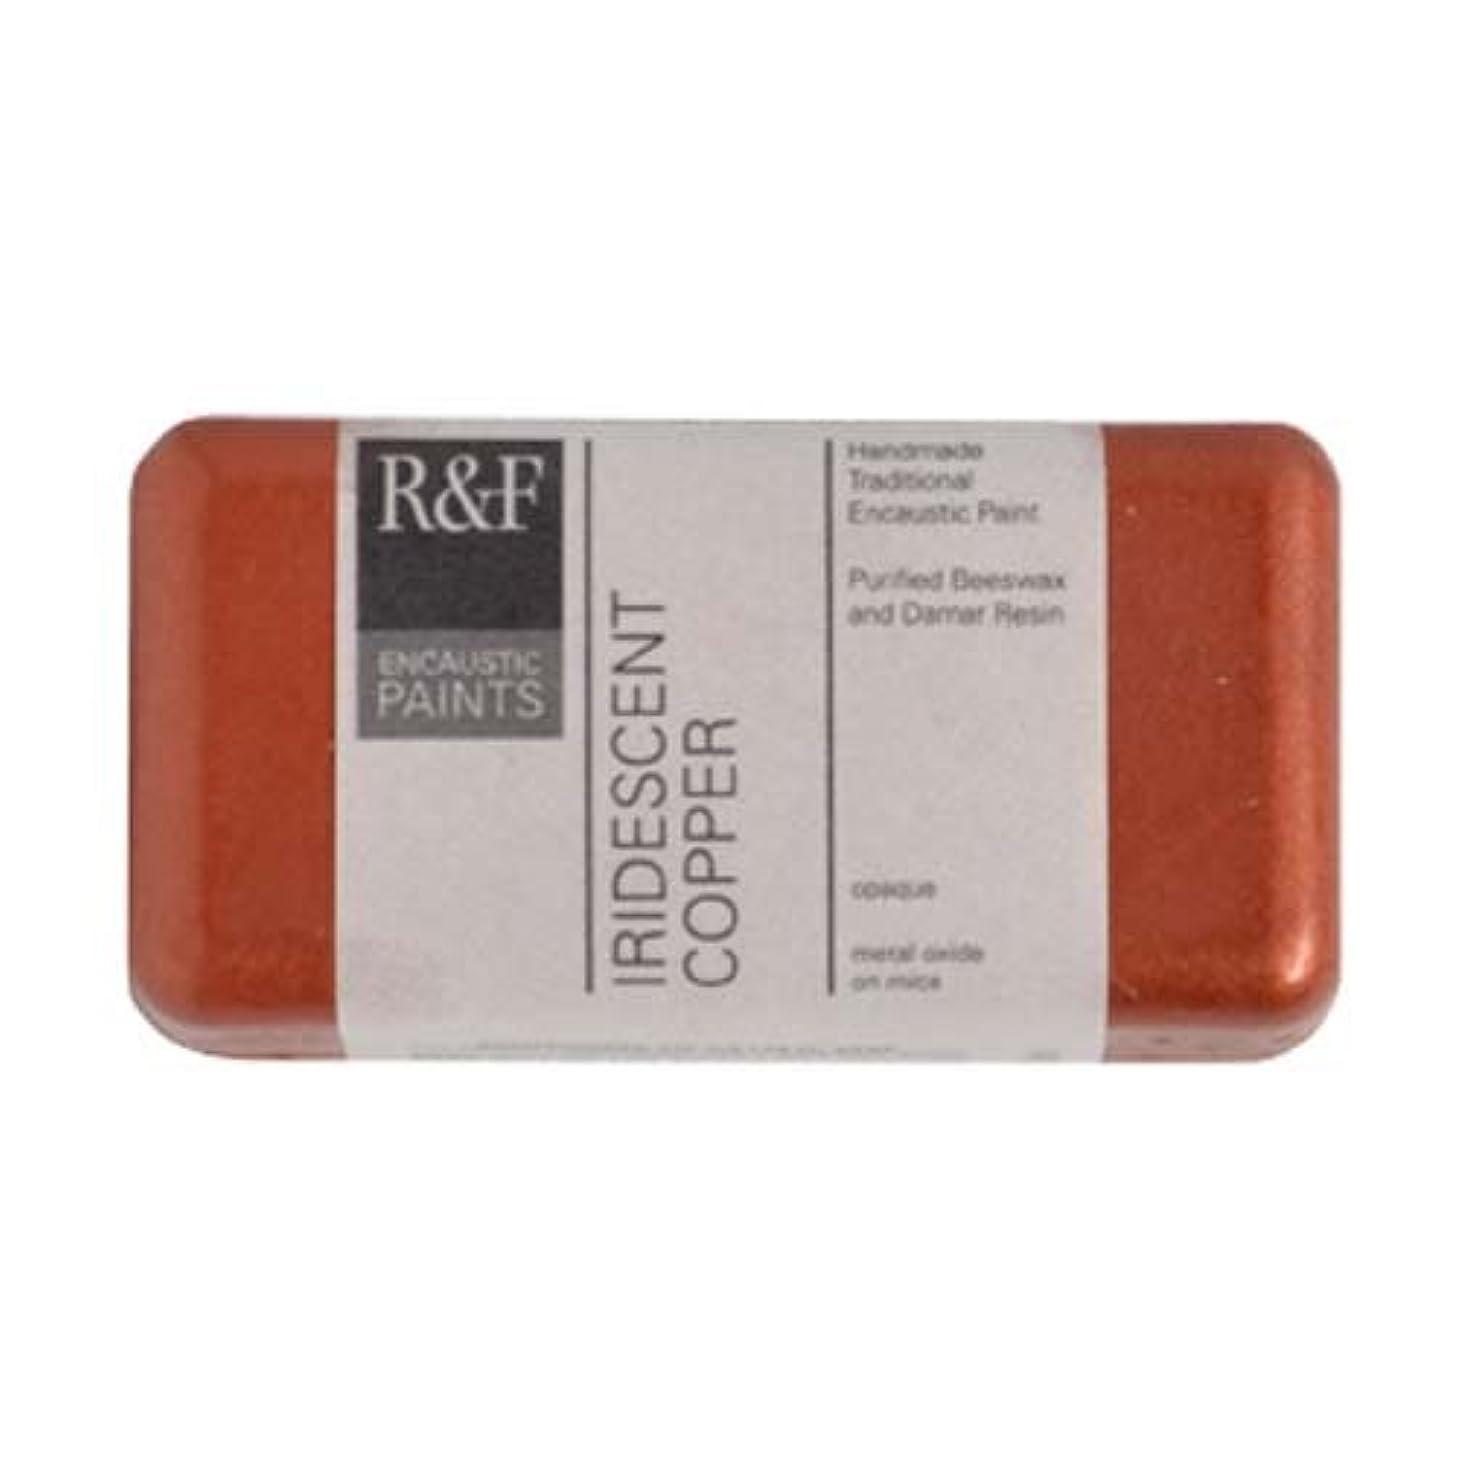 R&F Encaustic 40ml Paint, Iridescent Copper